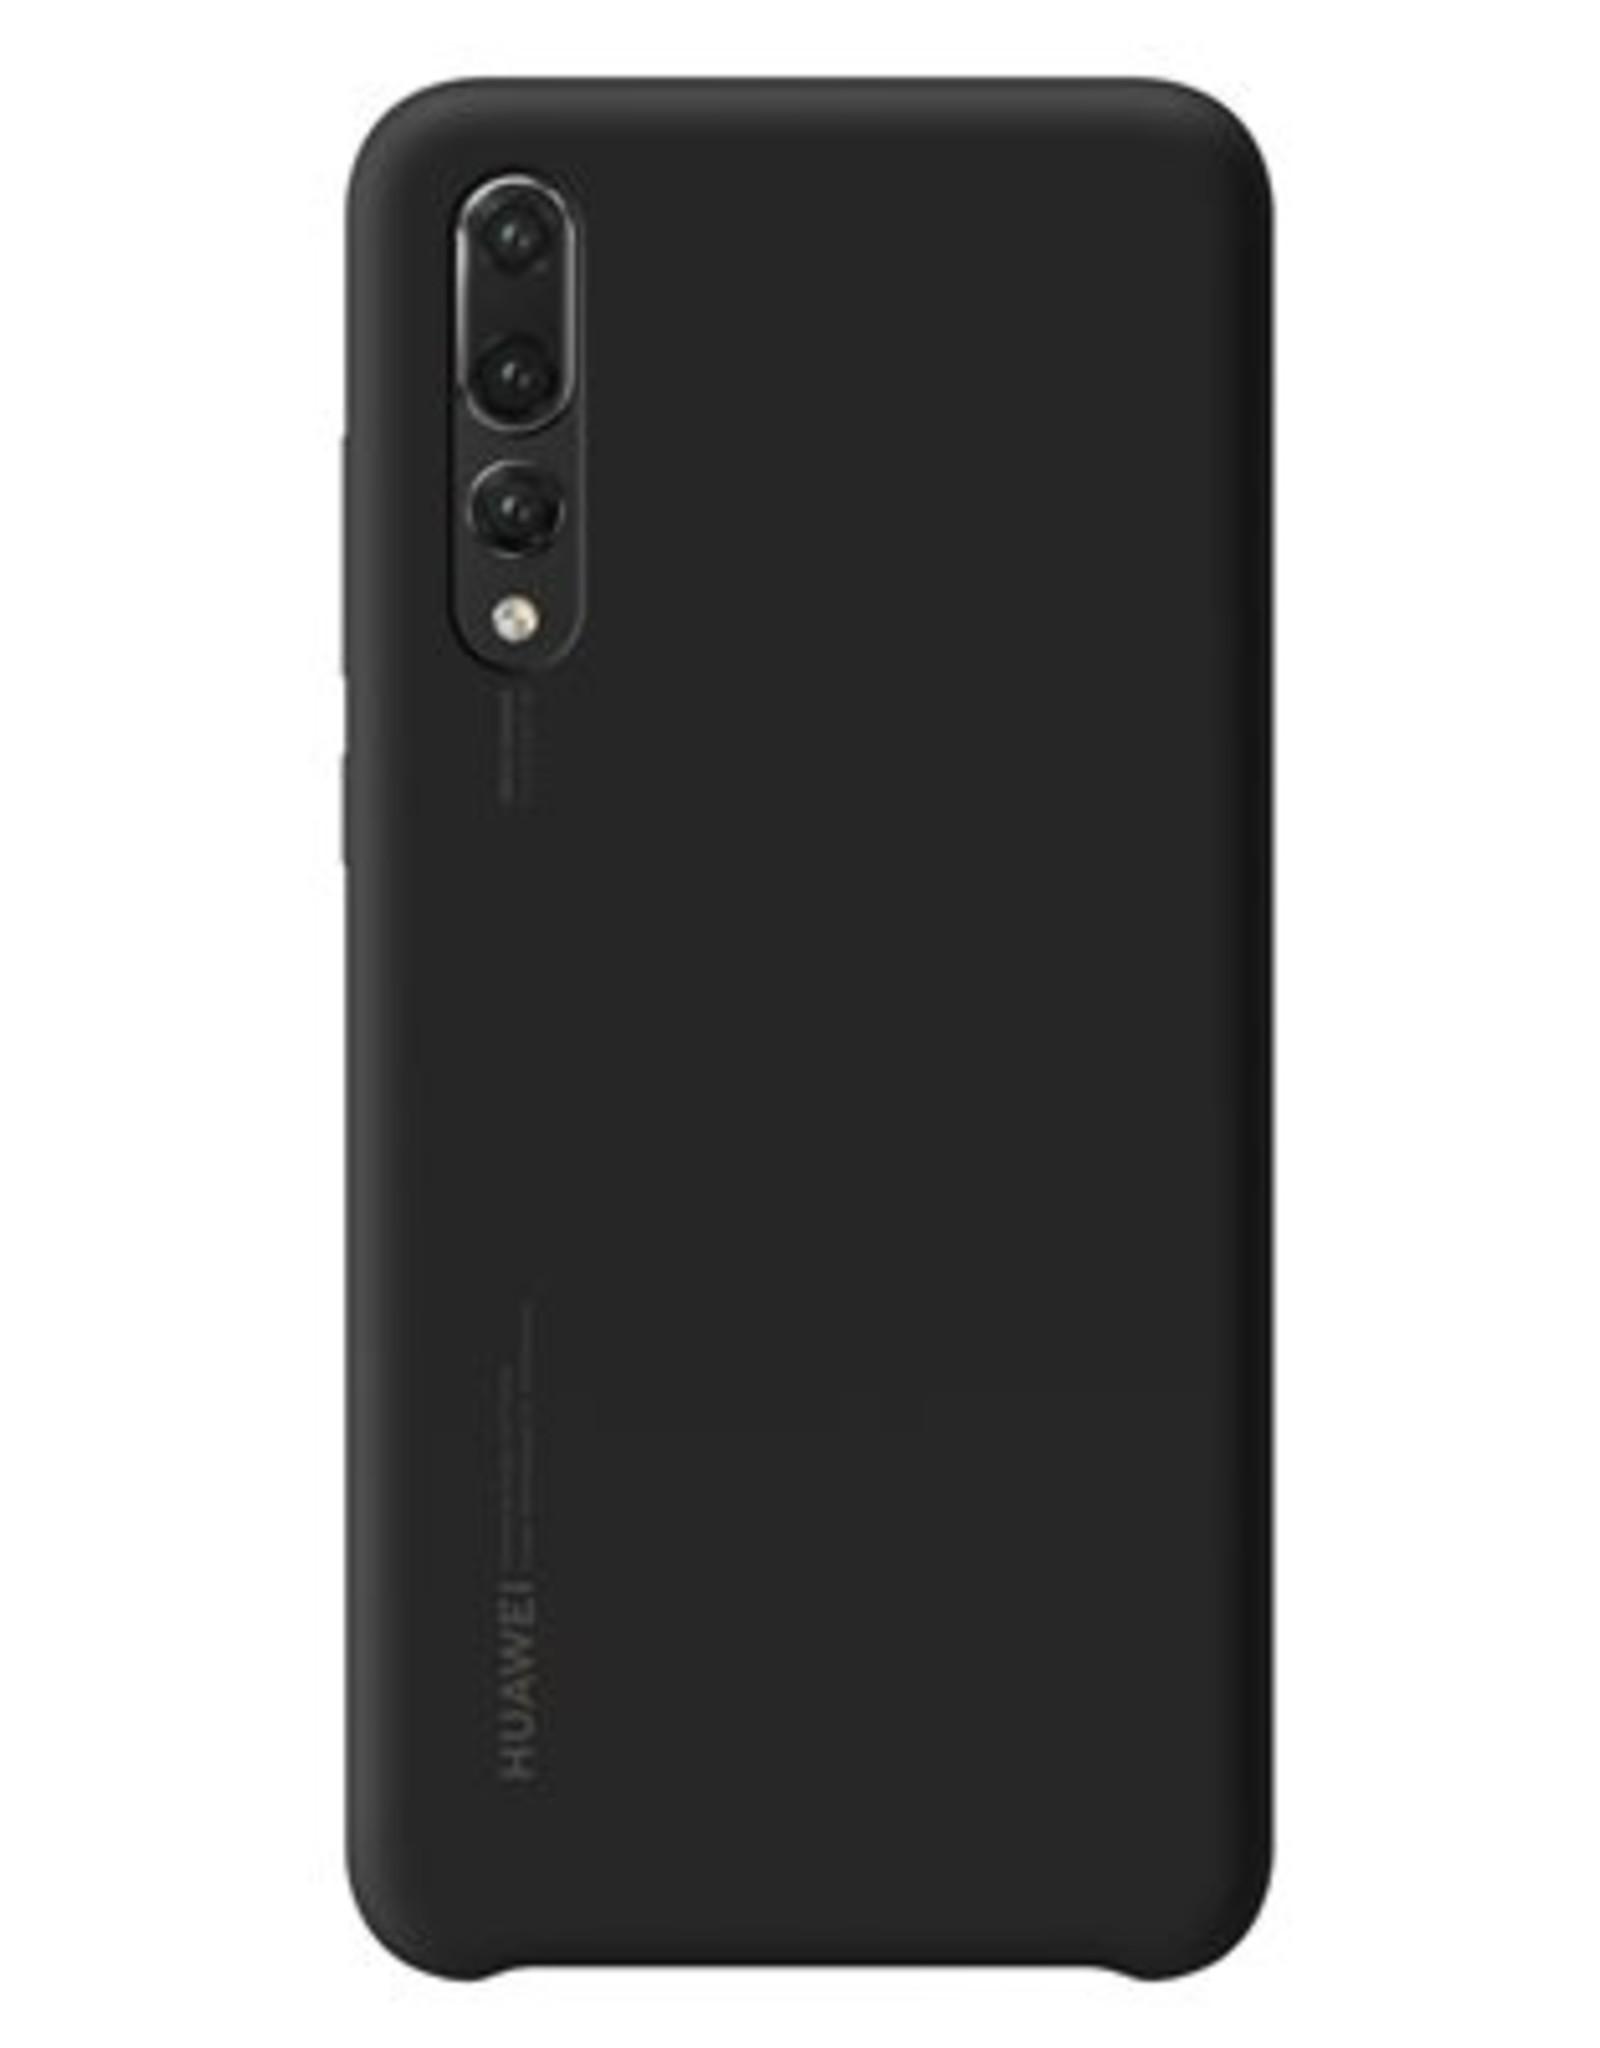 Huawei Huawei OEM silicone finish cover P20 Pro Black HWMS3014BK